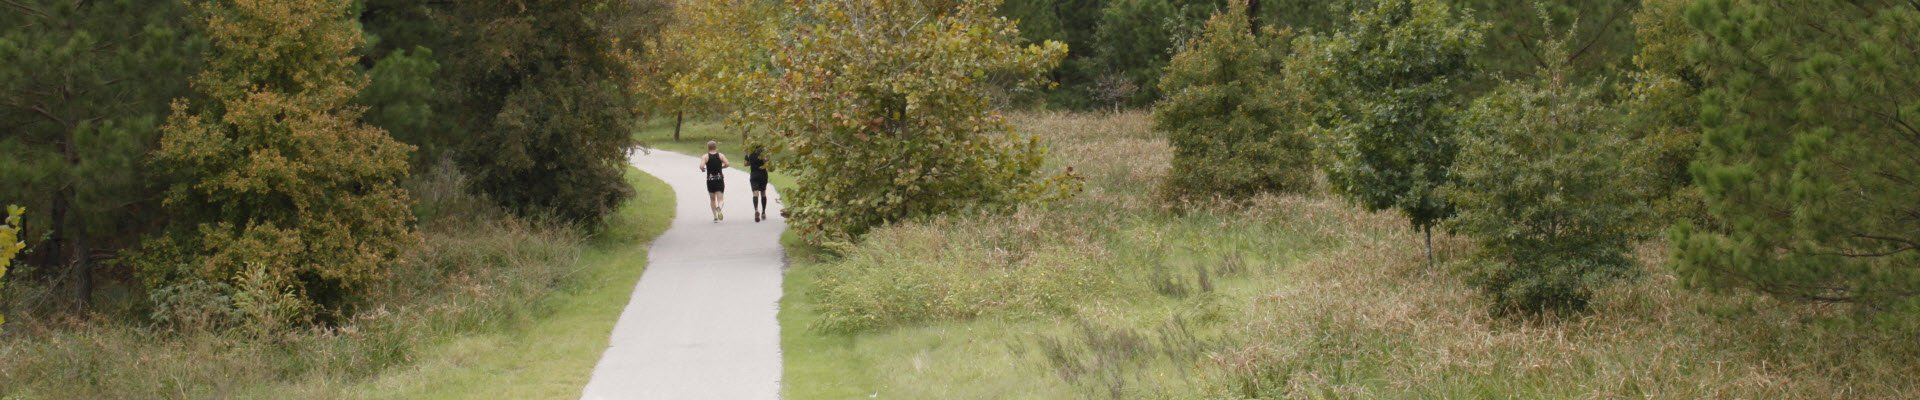 ber-greenway-robertson-runners-1920